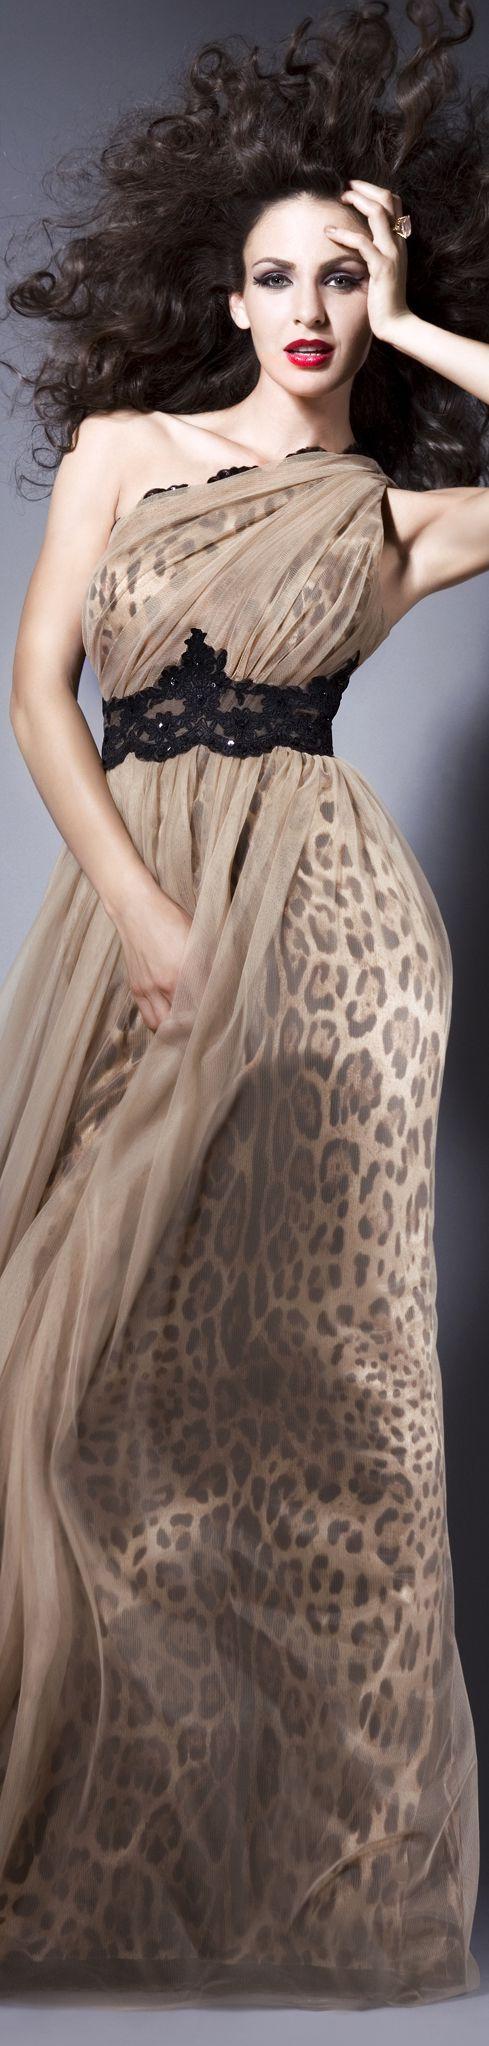 I AM WILD Collection: FALL IN LOVE  Rochie de seara animal print gown #animalprint #oneshoulder #dress!!!!!!!!